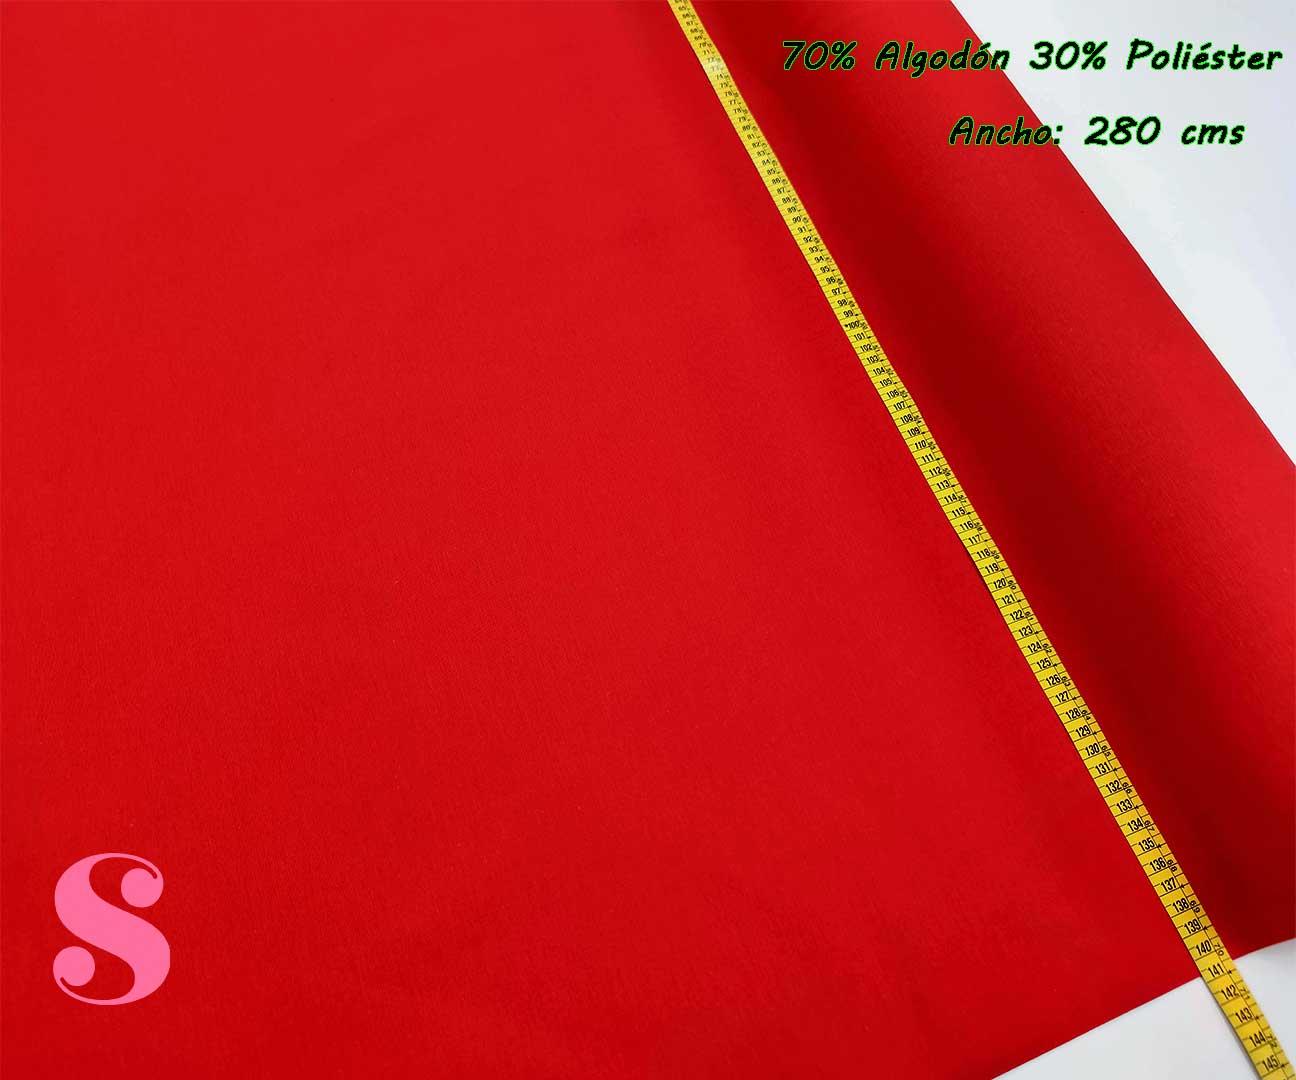 lonetas-de-buena-calidad,lonetas-de-exterior,lonetas-lisas-Loneta Lisa Roja